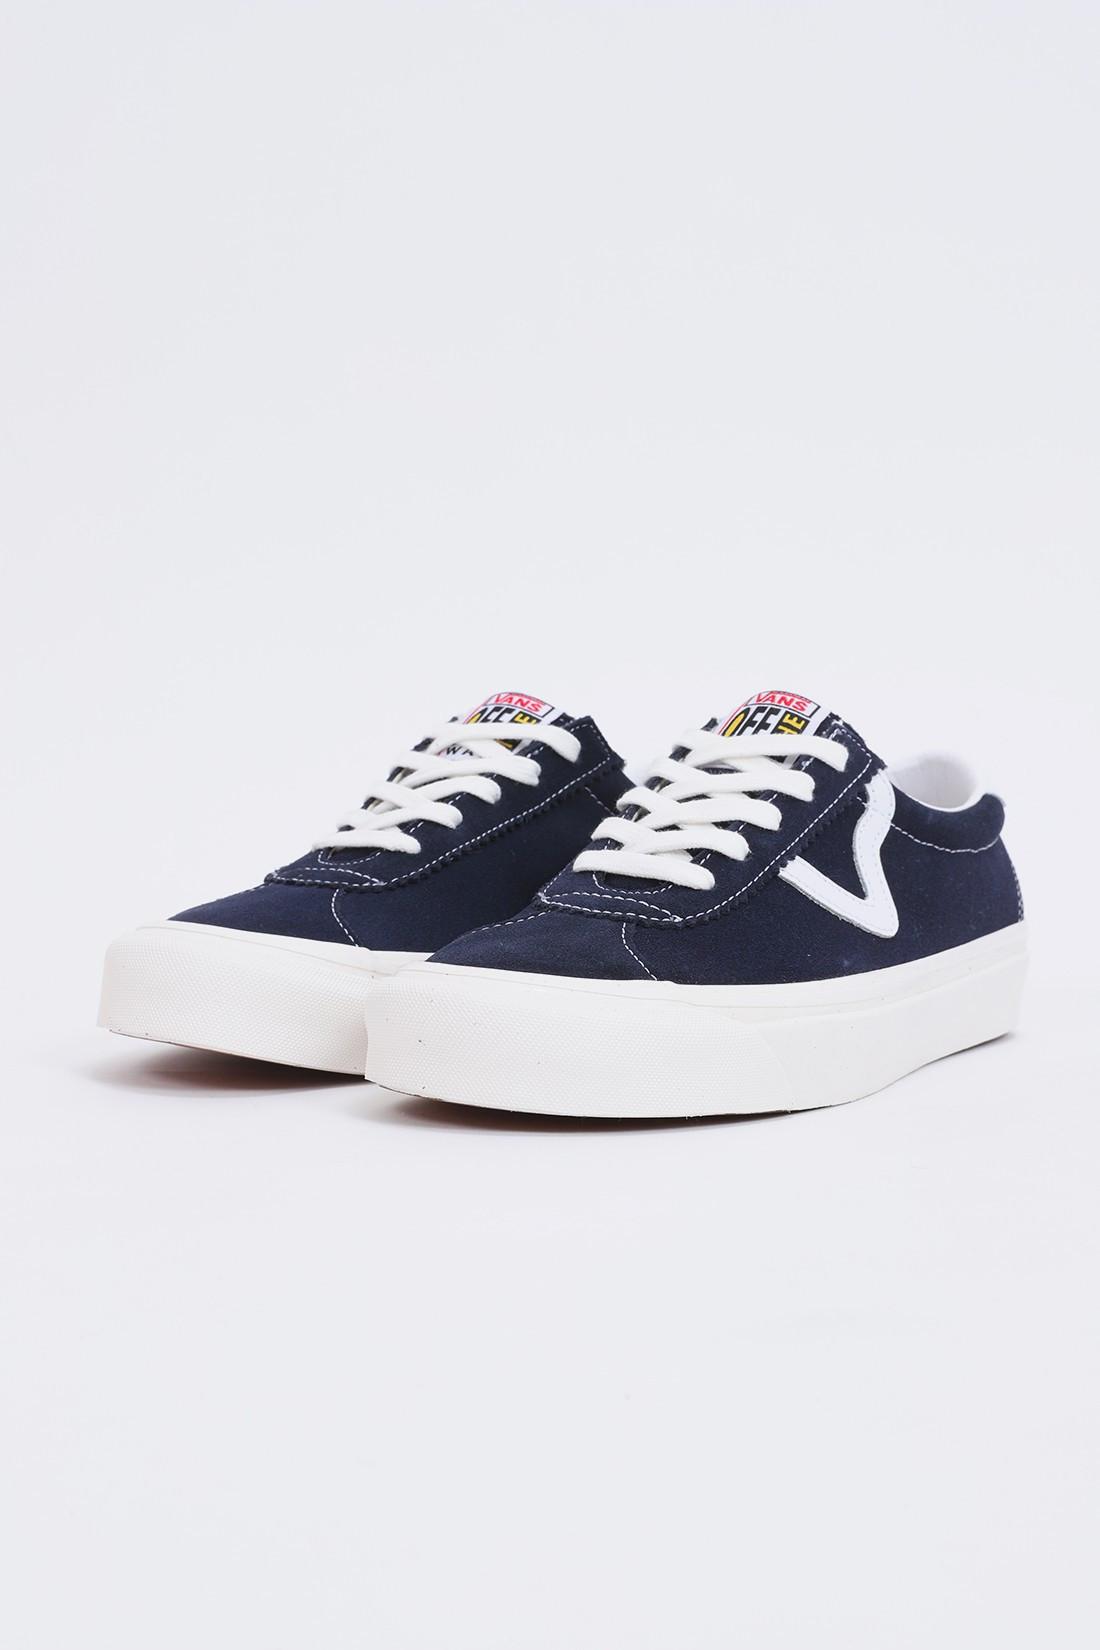 VANS / Style 73 dx Og navy